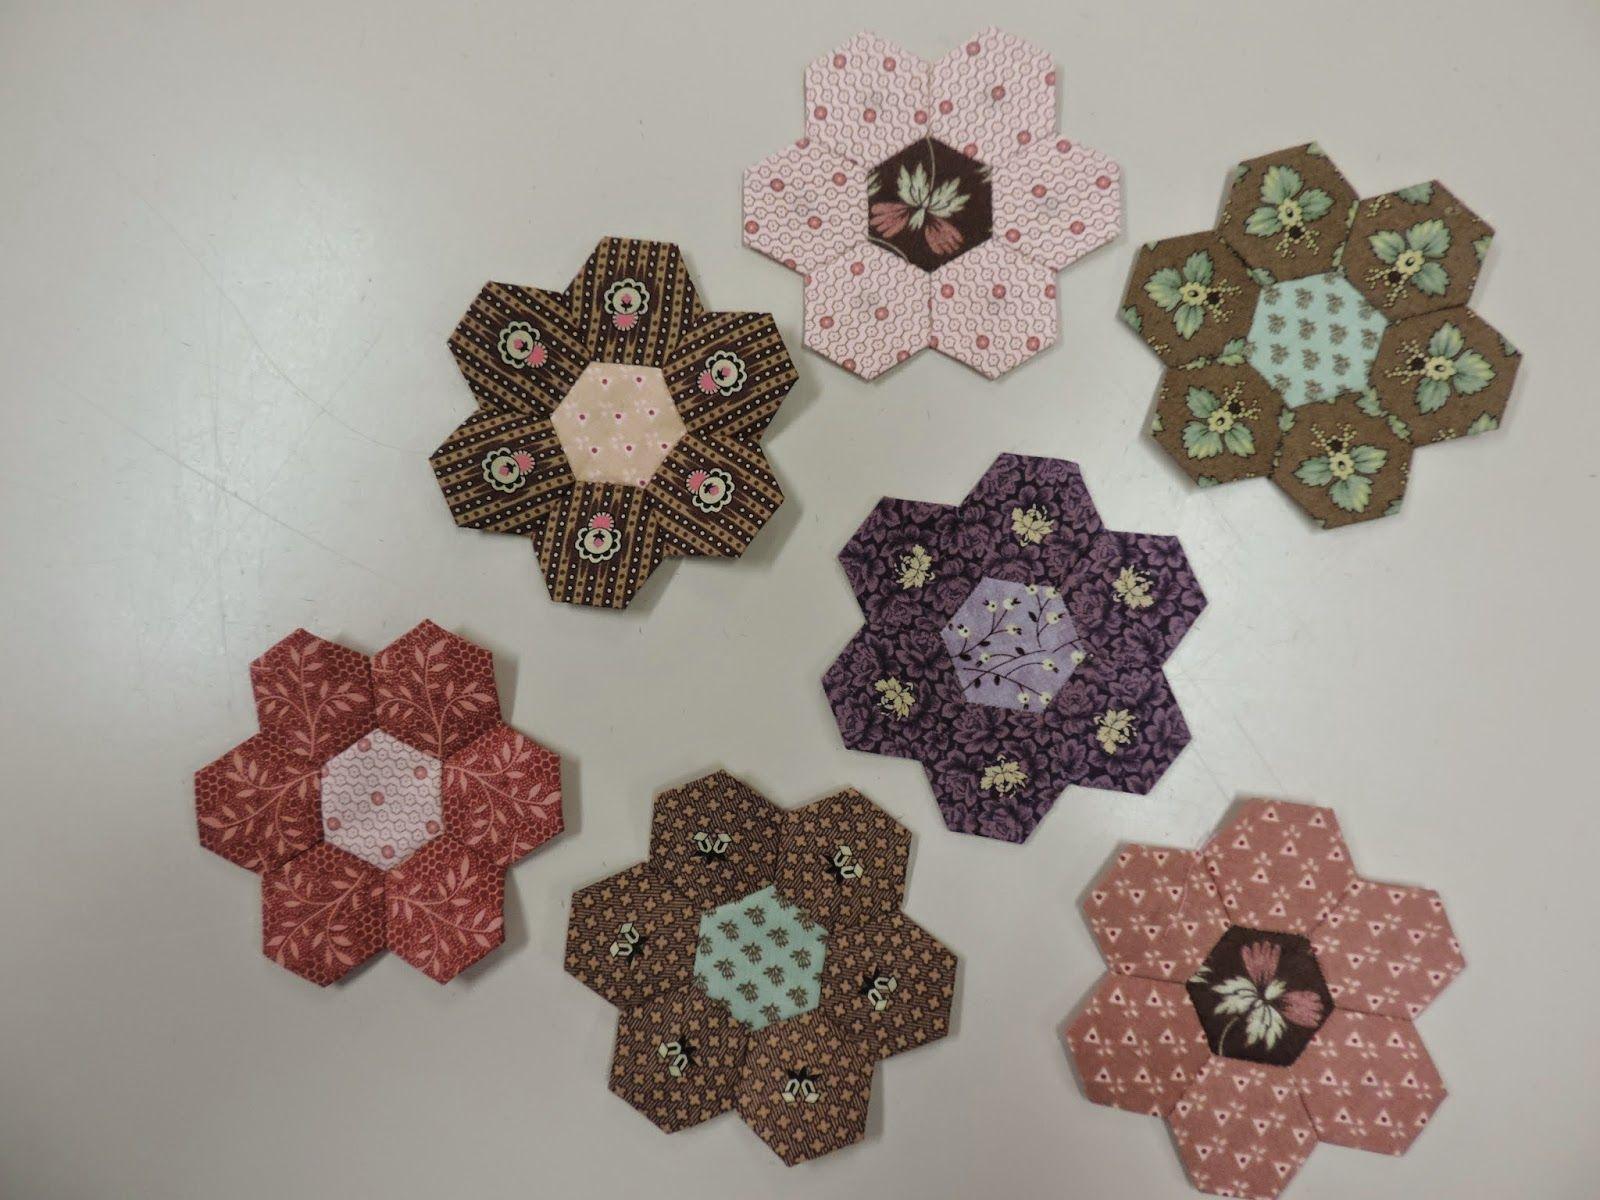 Katrina Hadjimichael's Blog: Jane Austen Quilts at Patchwork Plus, Miranda